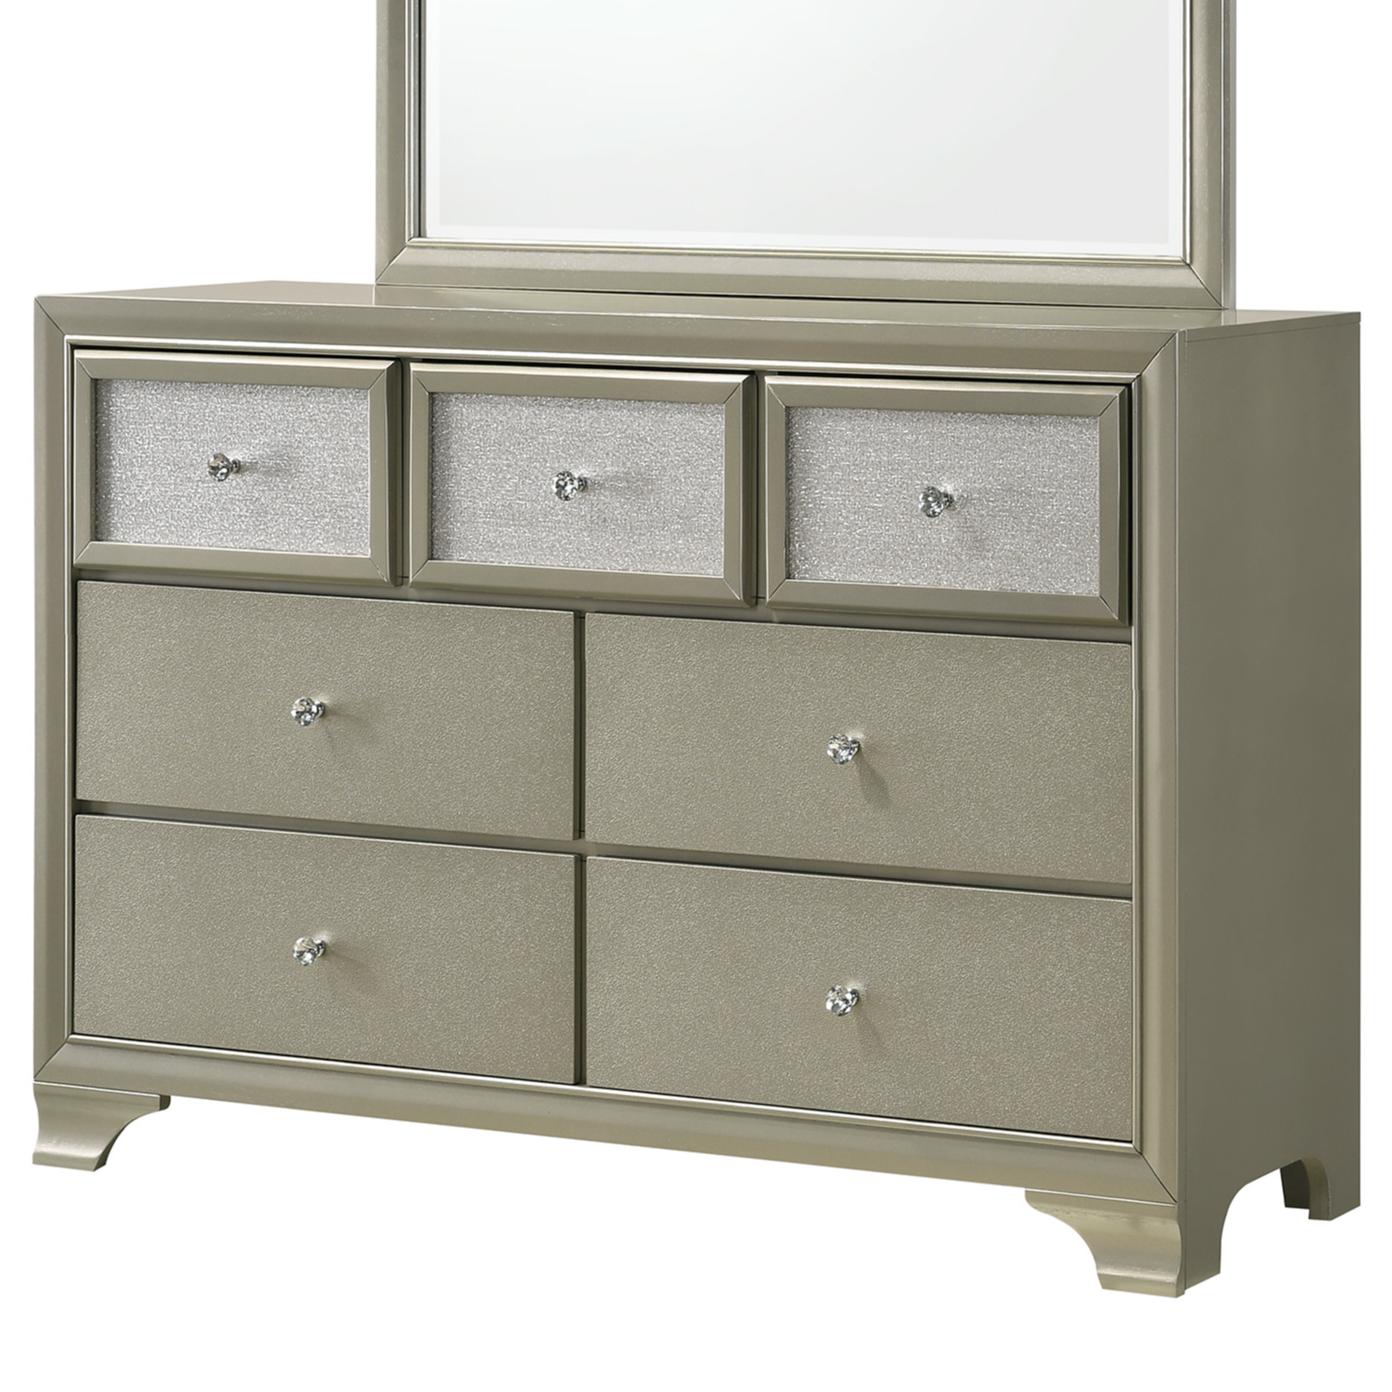 Landyn Dresser by Crown Mark at Dream Home Interiors